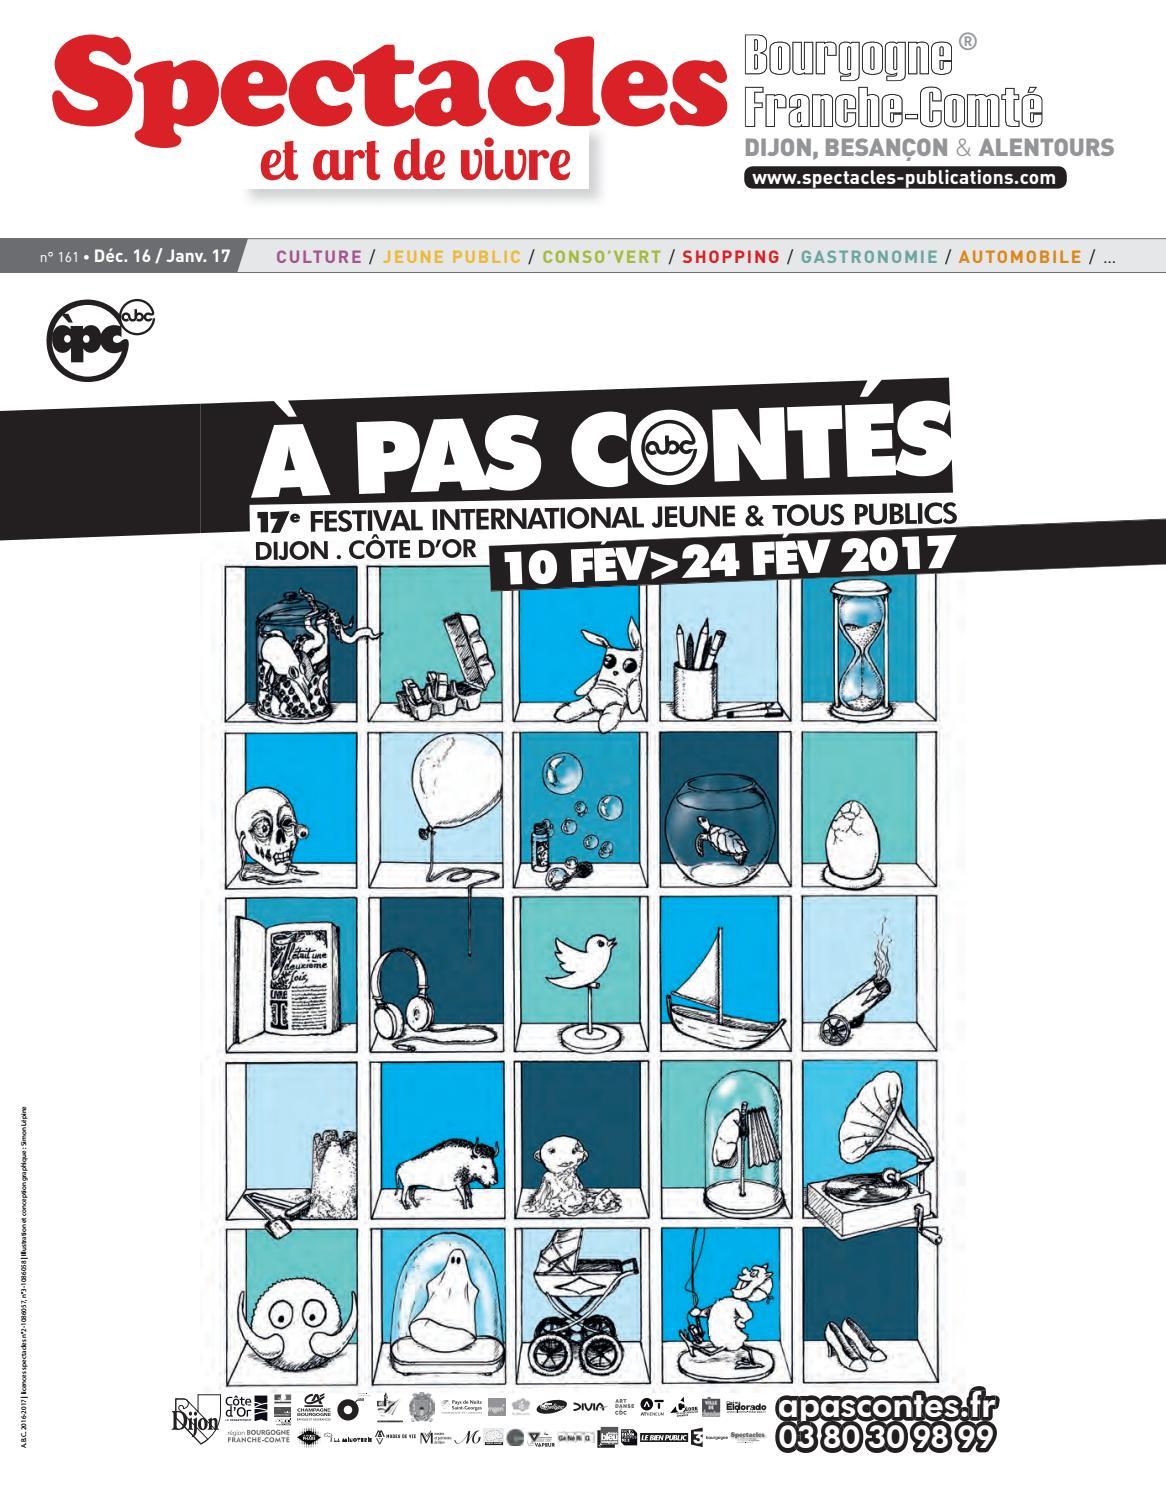 d603d2e4a18ec Spectacles Publications Dijon n°161 / Décembre 2016 - Janvier 2017 by  SPECTACLES PUBLICATIONS - issuu